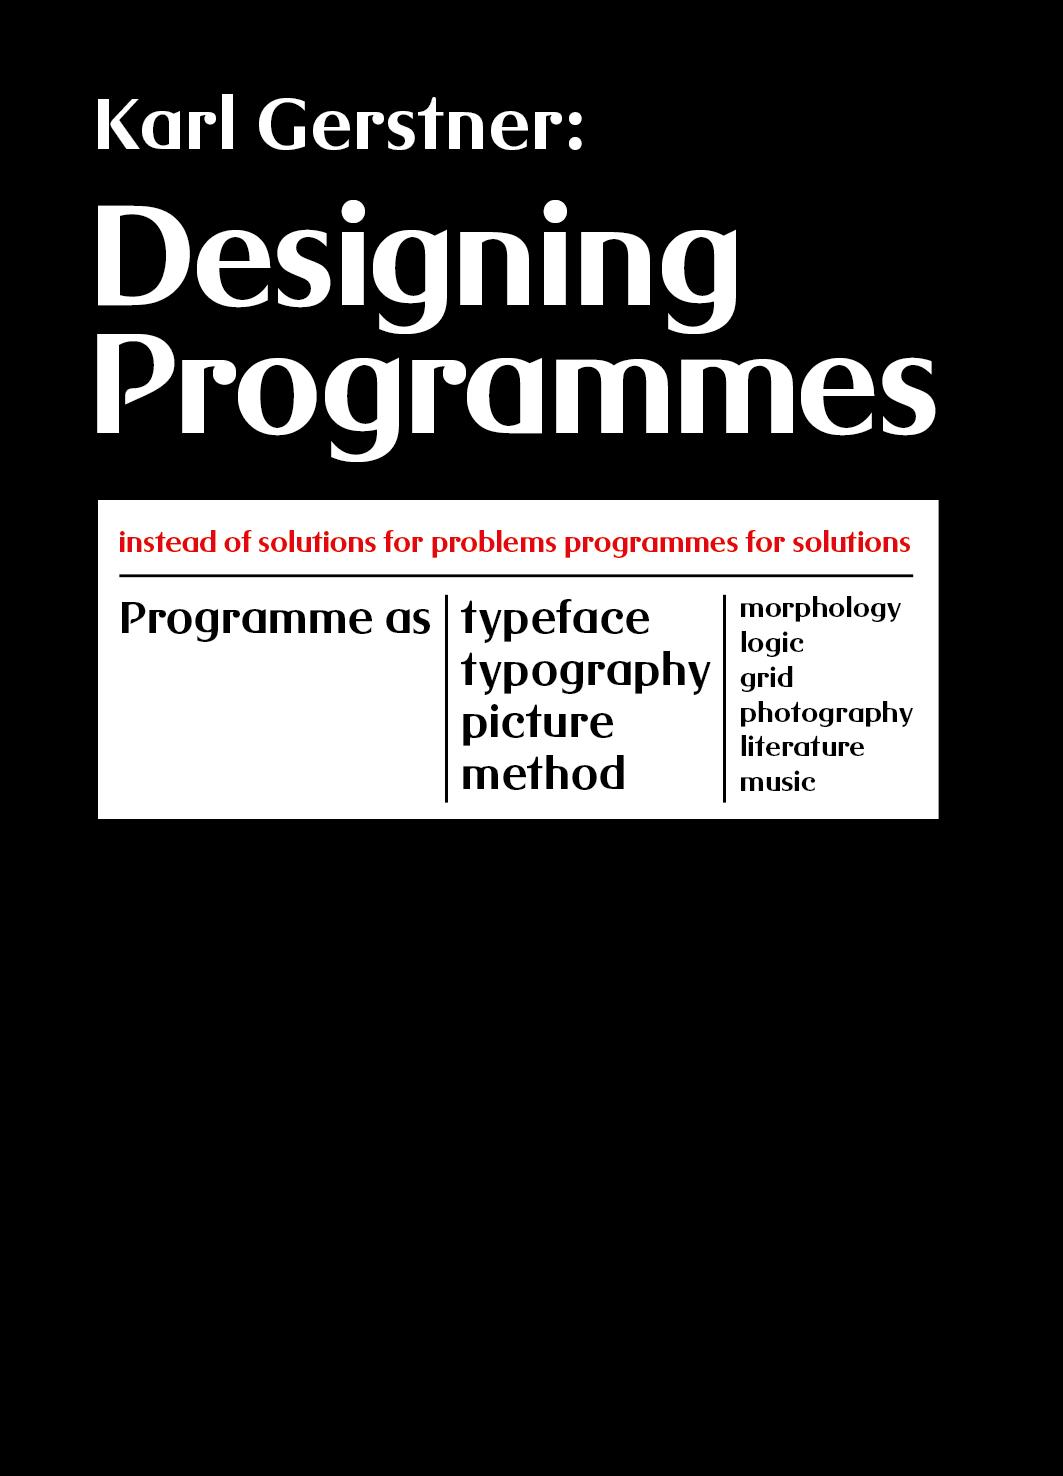 Designing Programmes Title